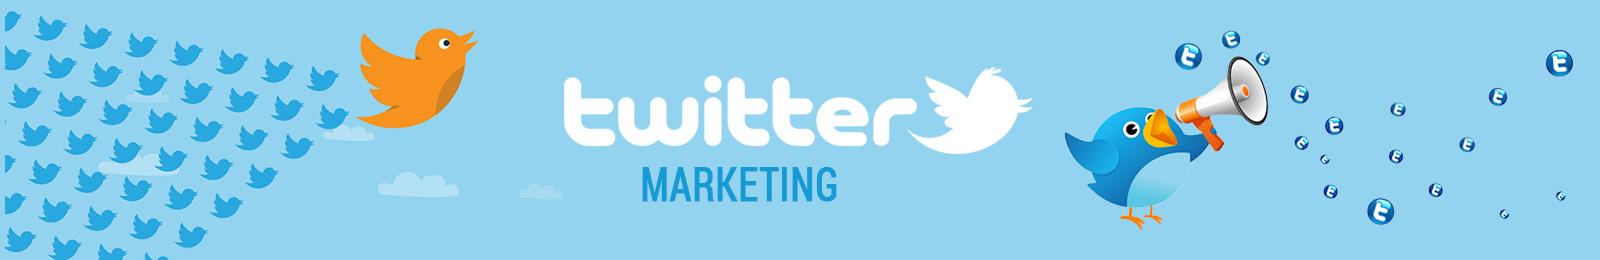 twitter marketing course training institute proideators